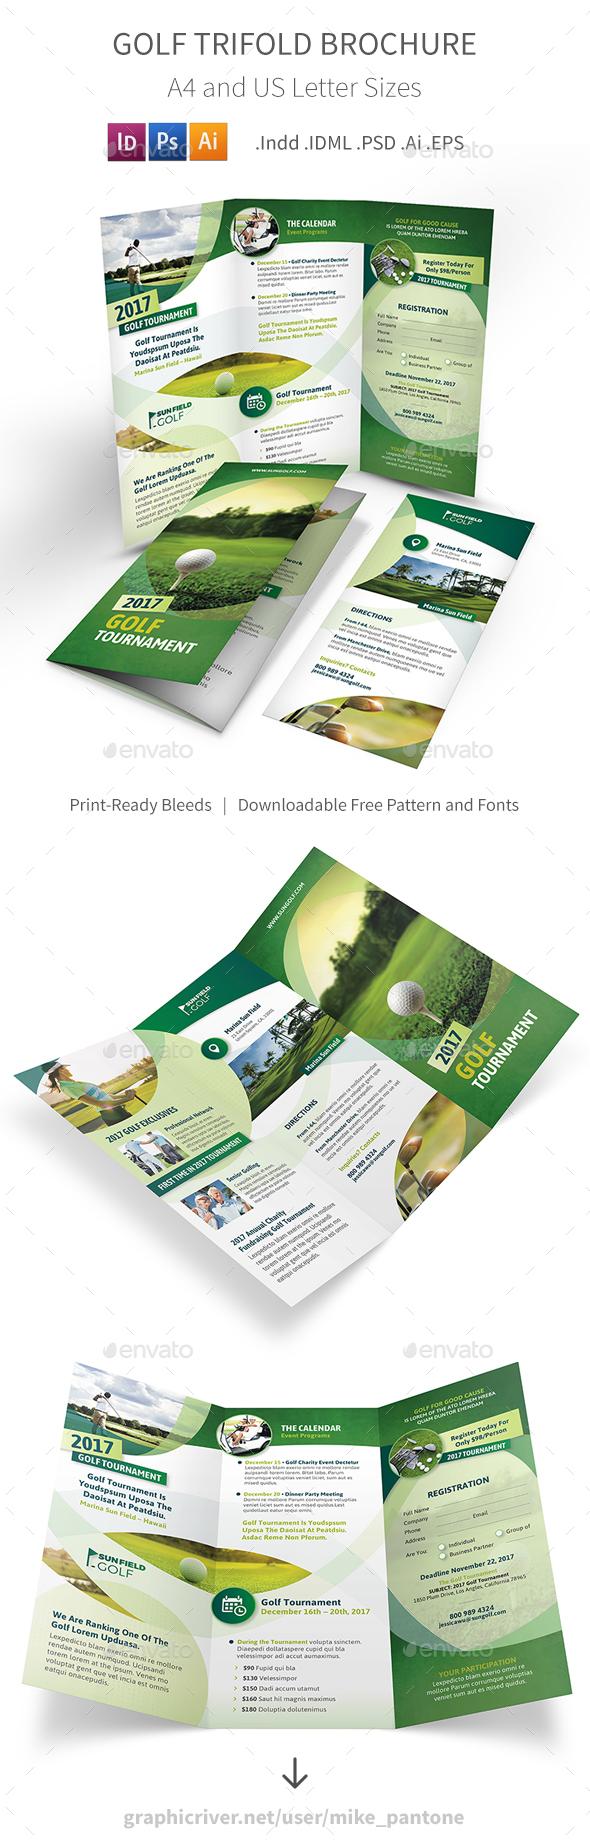 Golf Trifold Brochure 7 - Informational Brochures